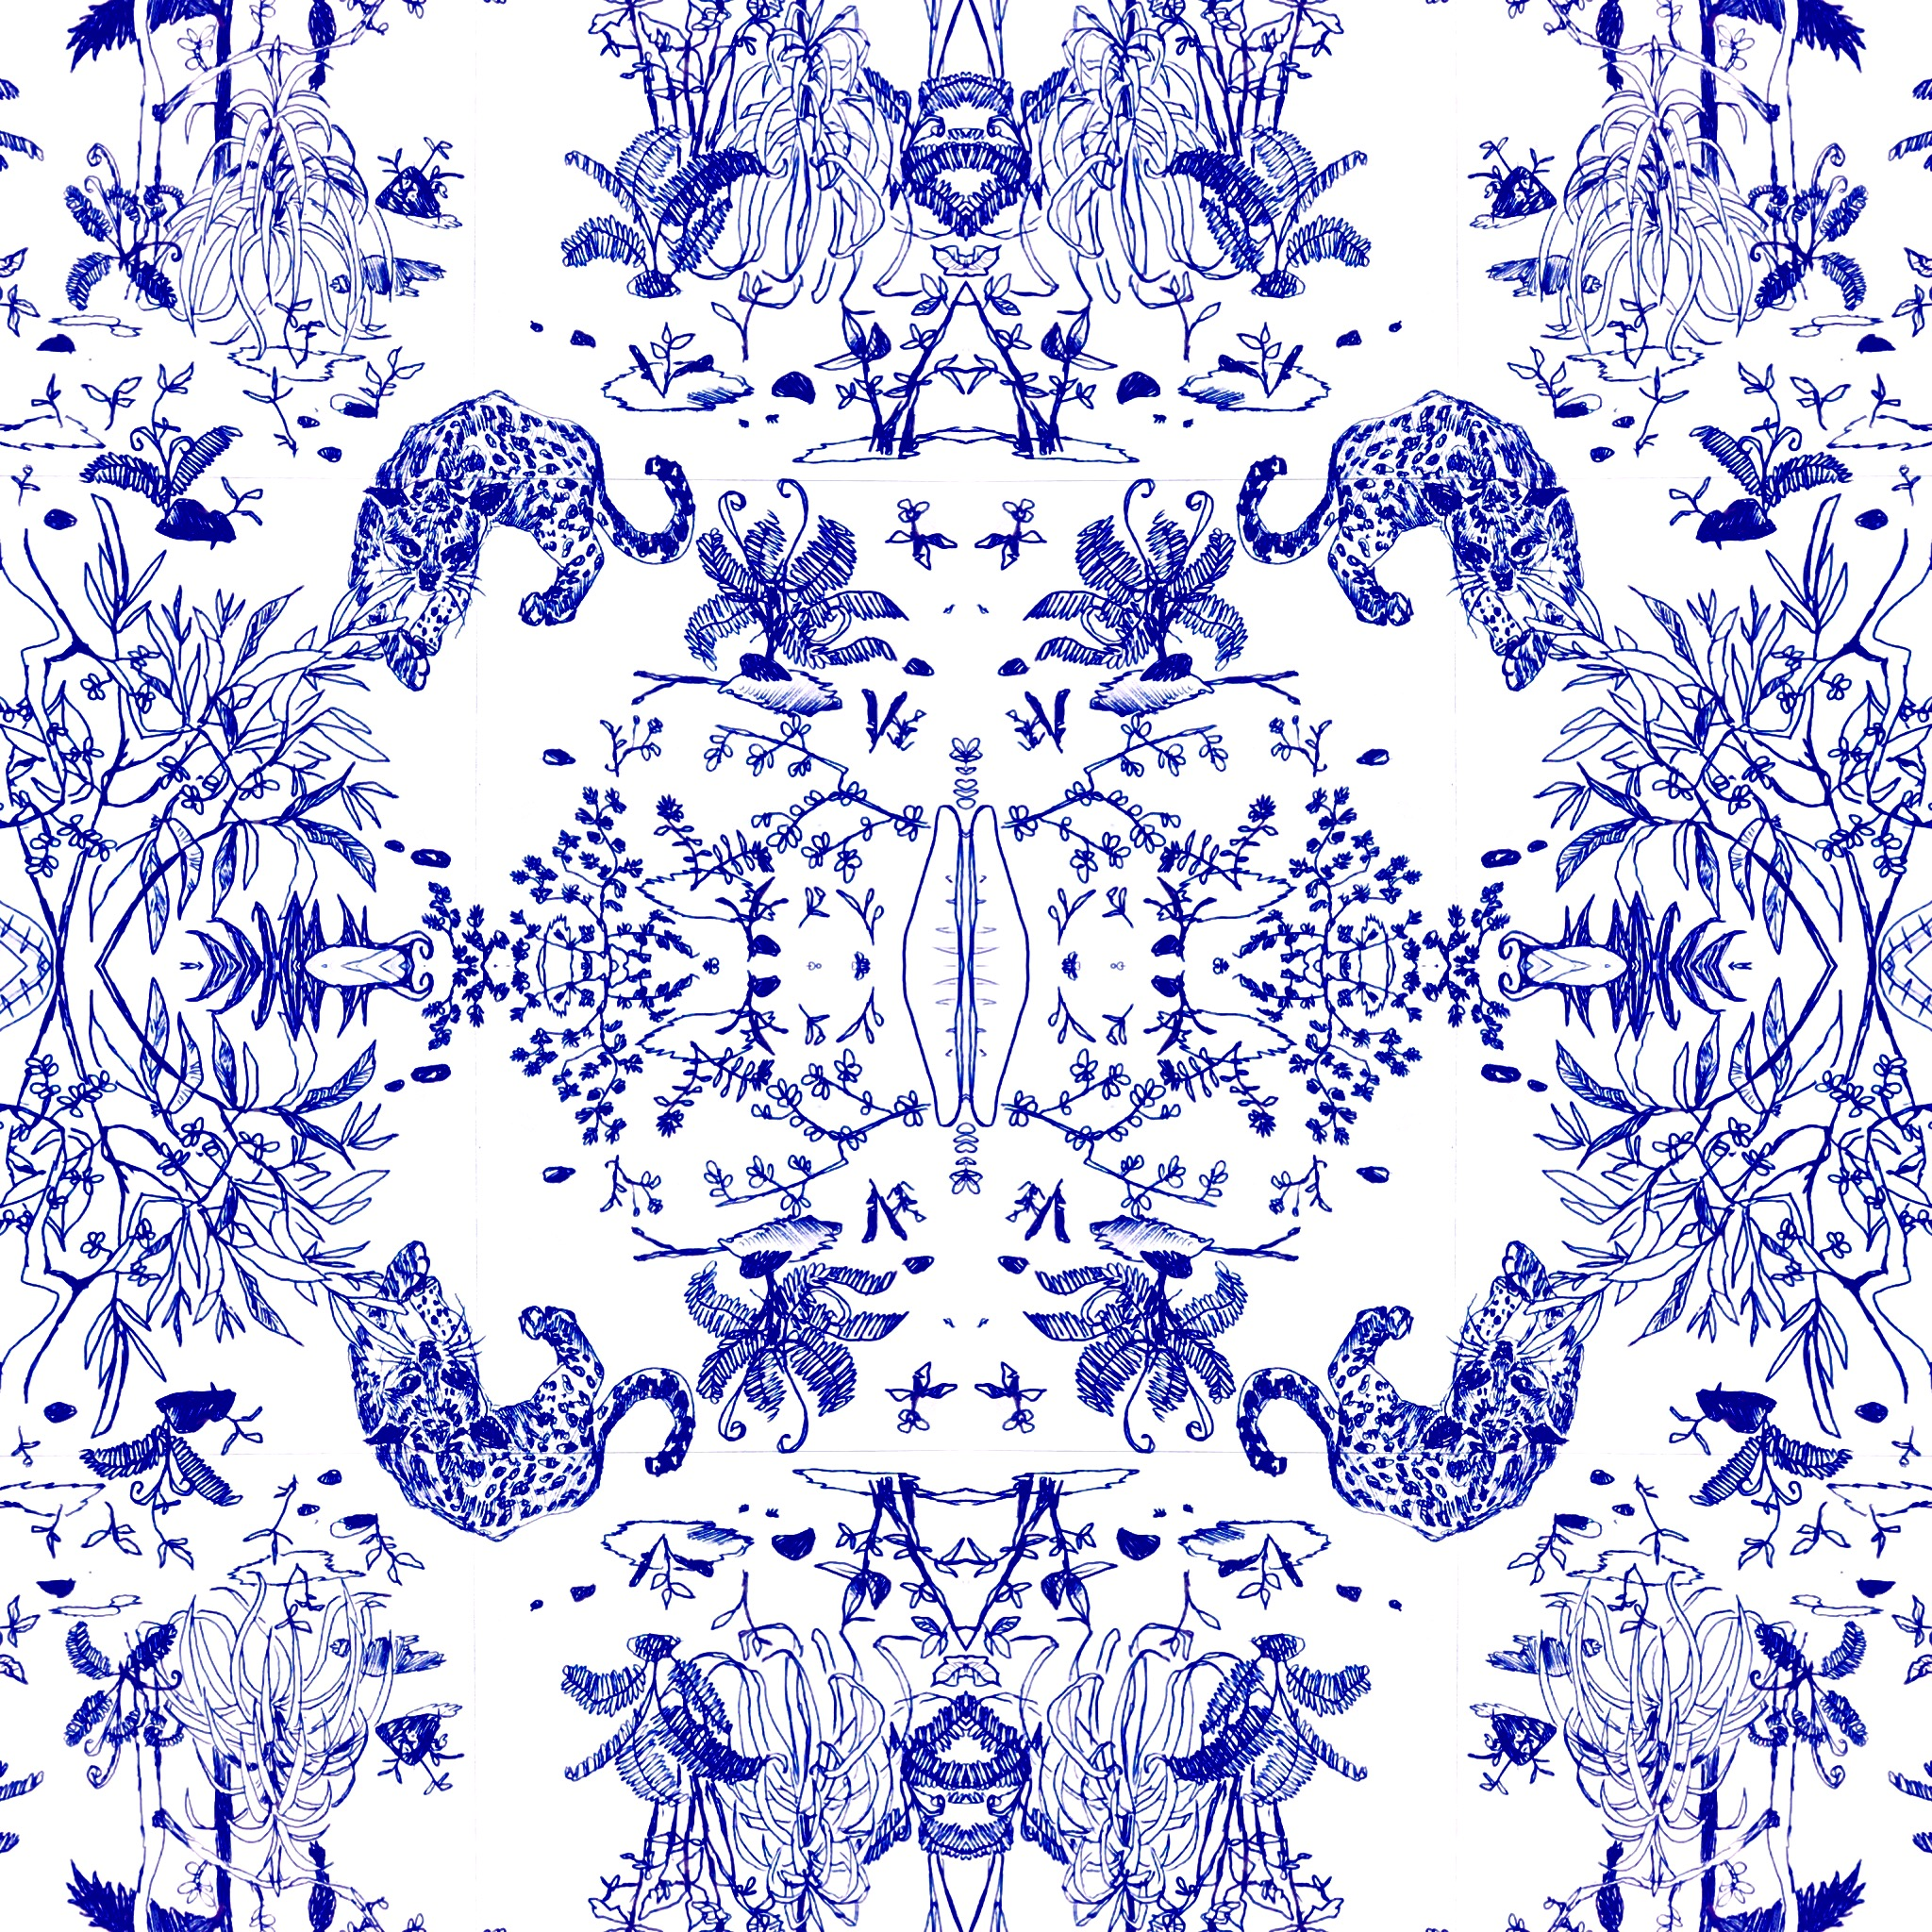 Jungle ocelot textile design pattern making license nature wild animal art